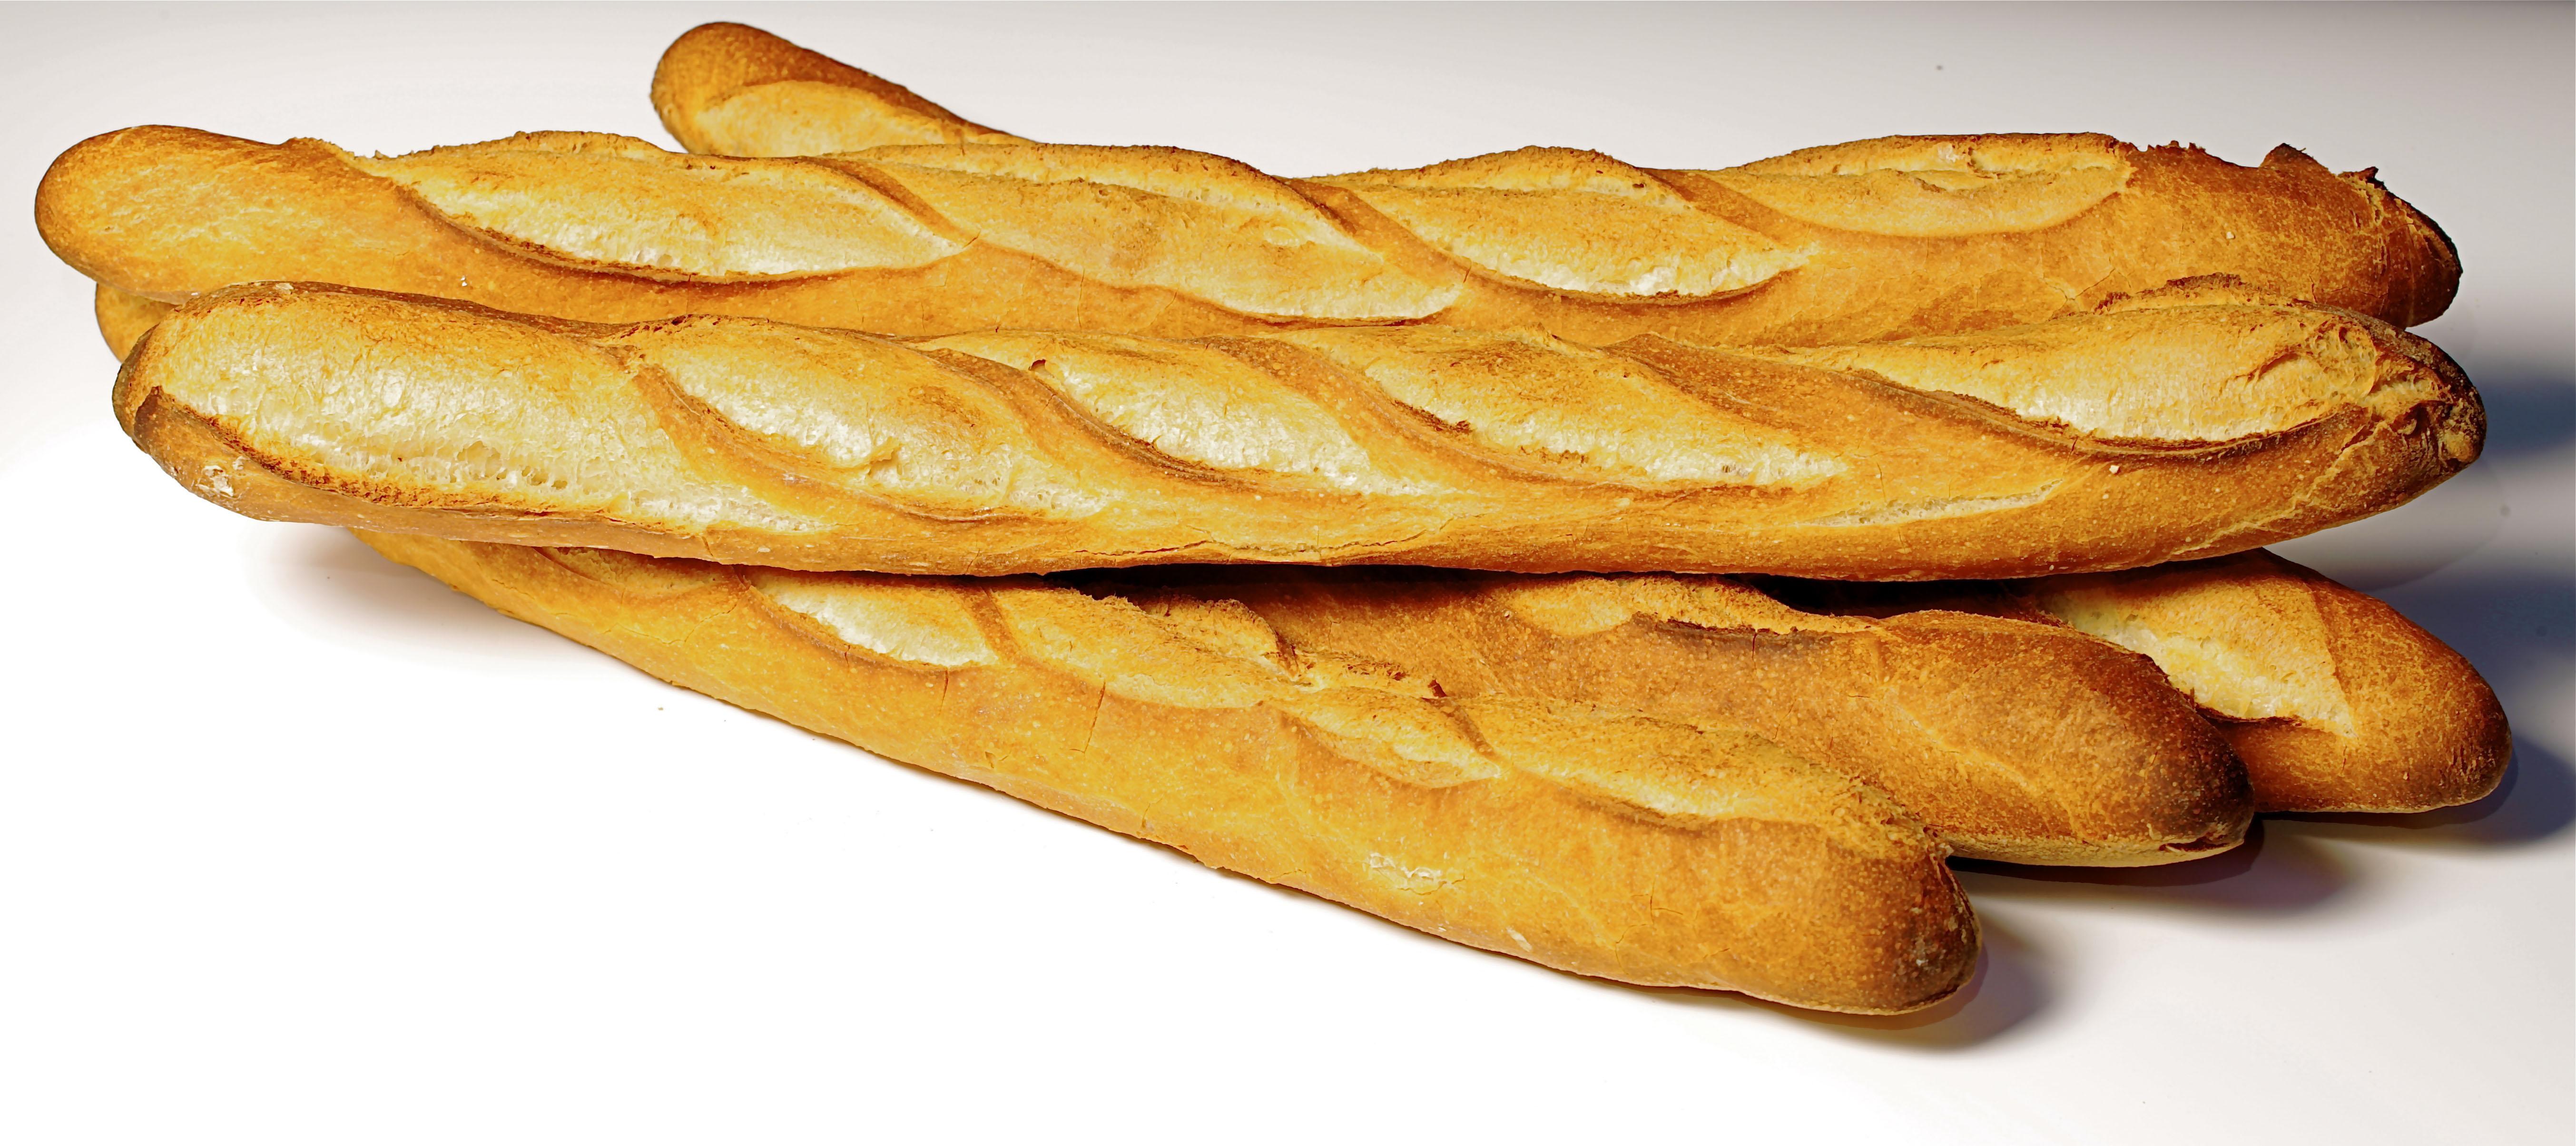 5 baguettes 1 gratuite boulangerie lieval. Black Bedroom Furniture Sets. Home Design Ideas